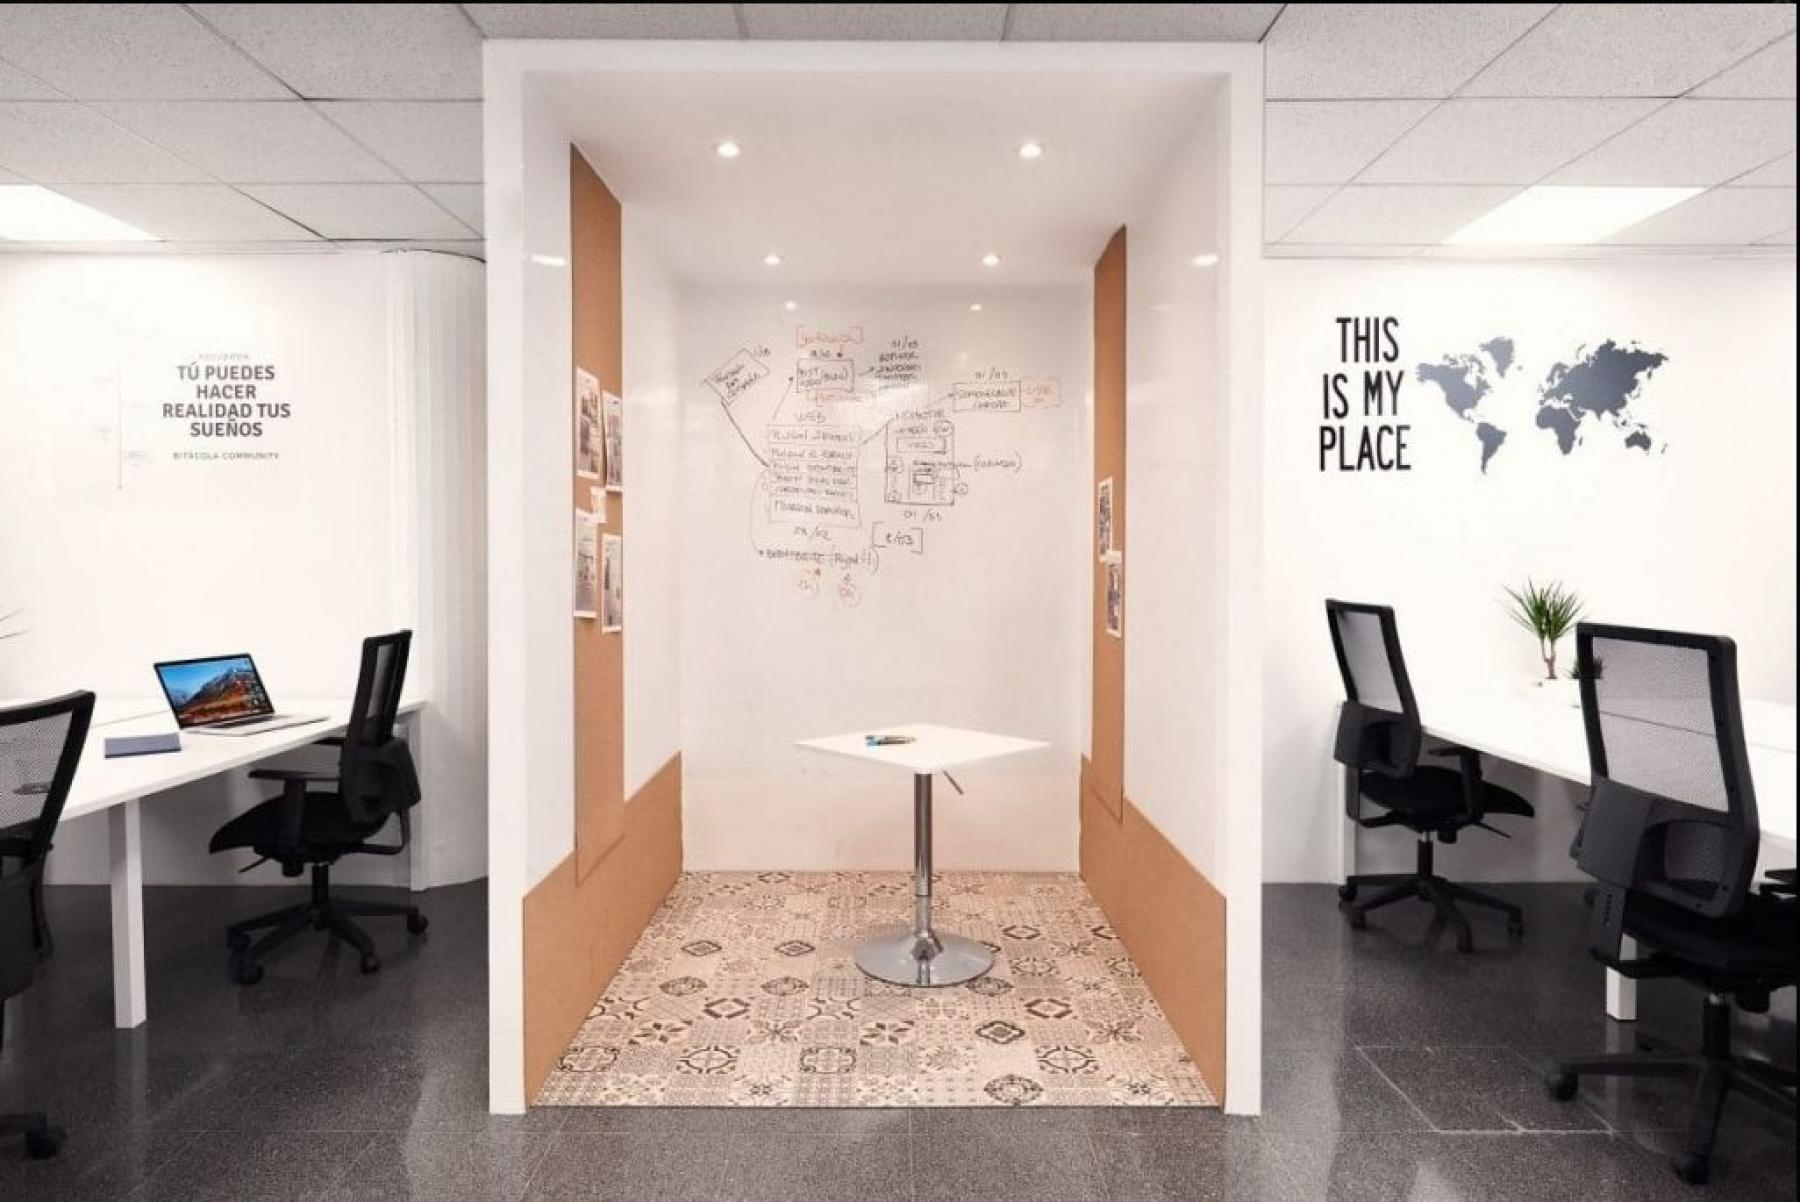 Alquilar oficinas Carretera Rubí 88, Barcelona (3)